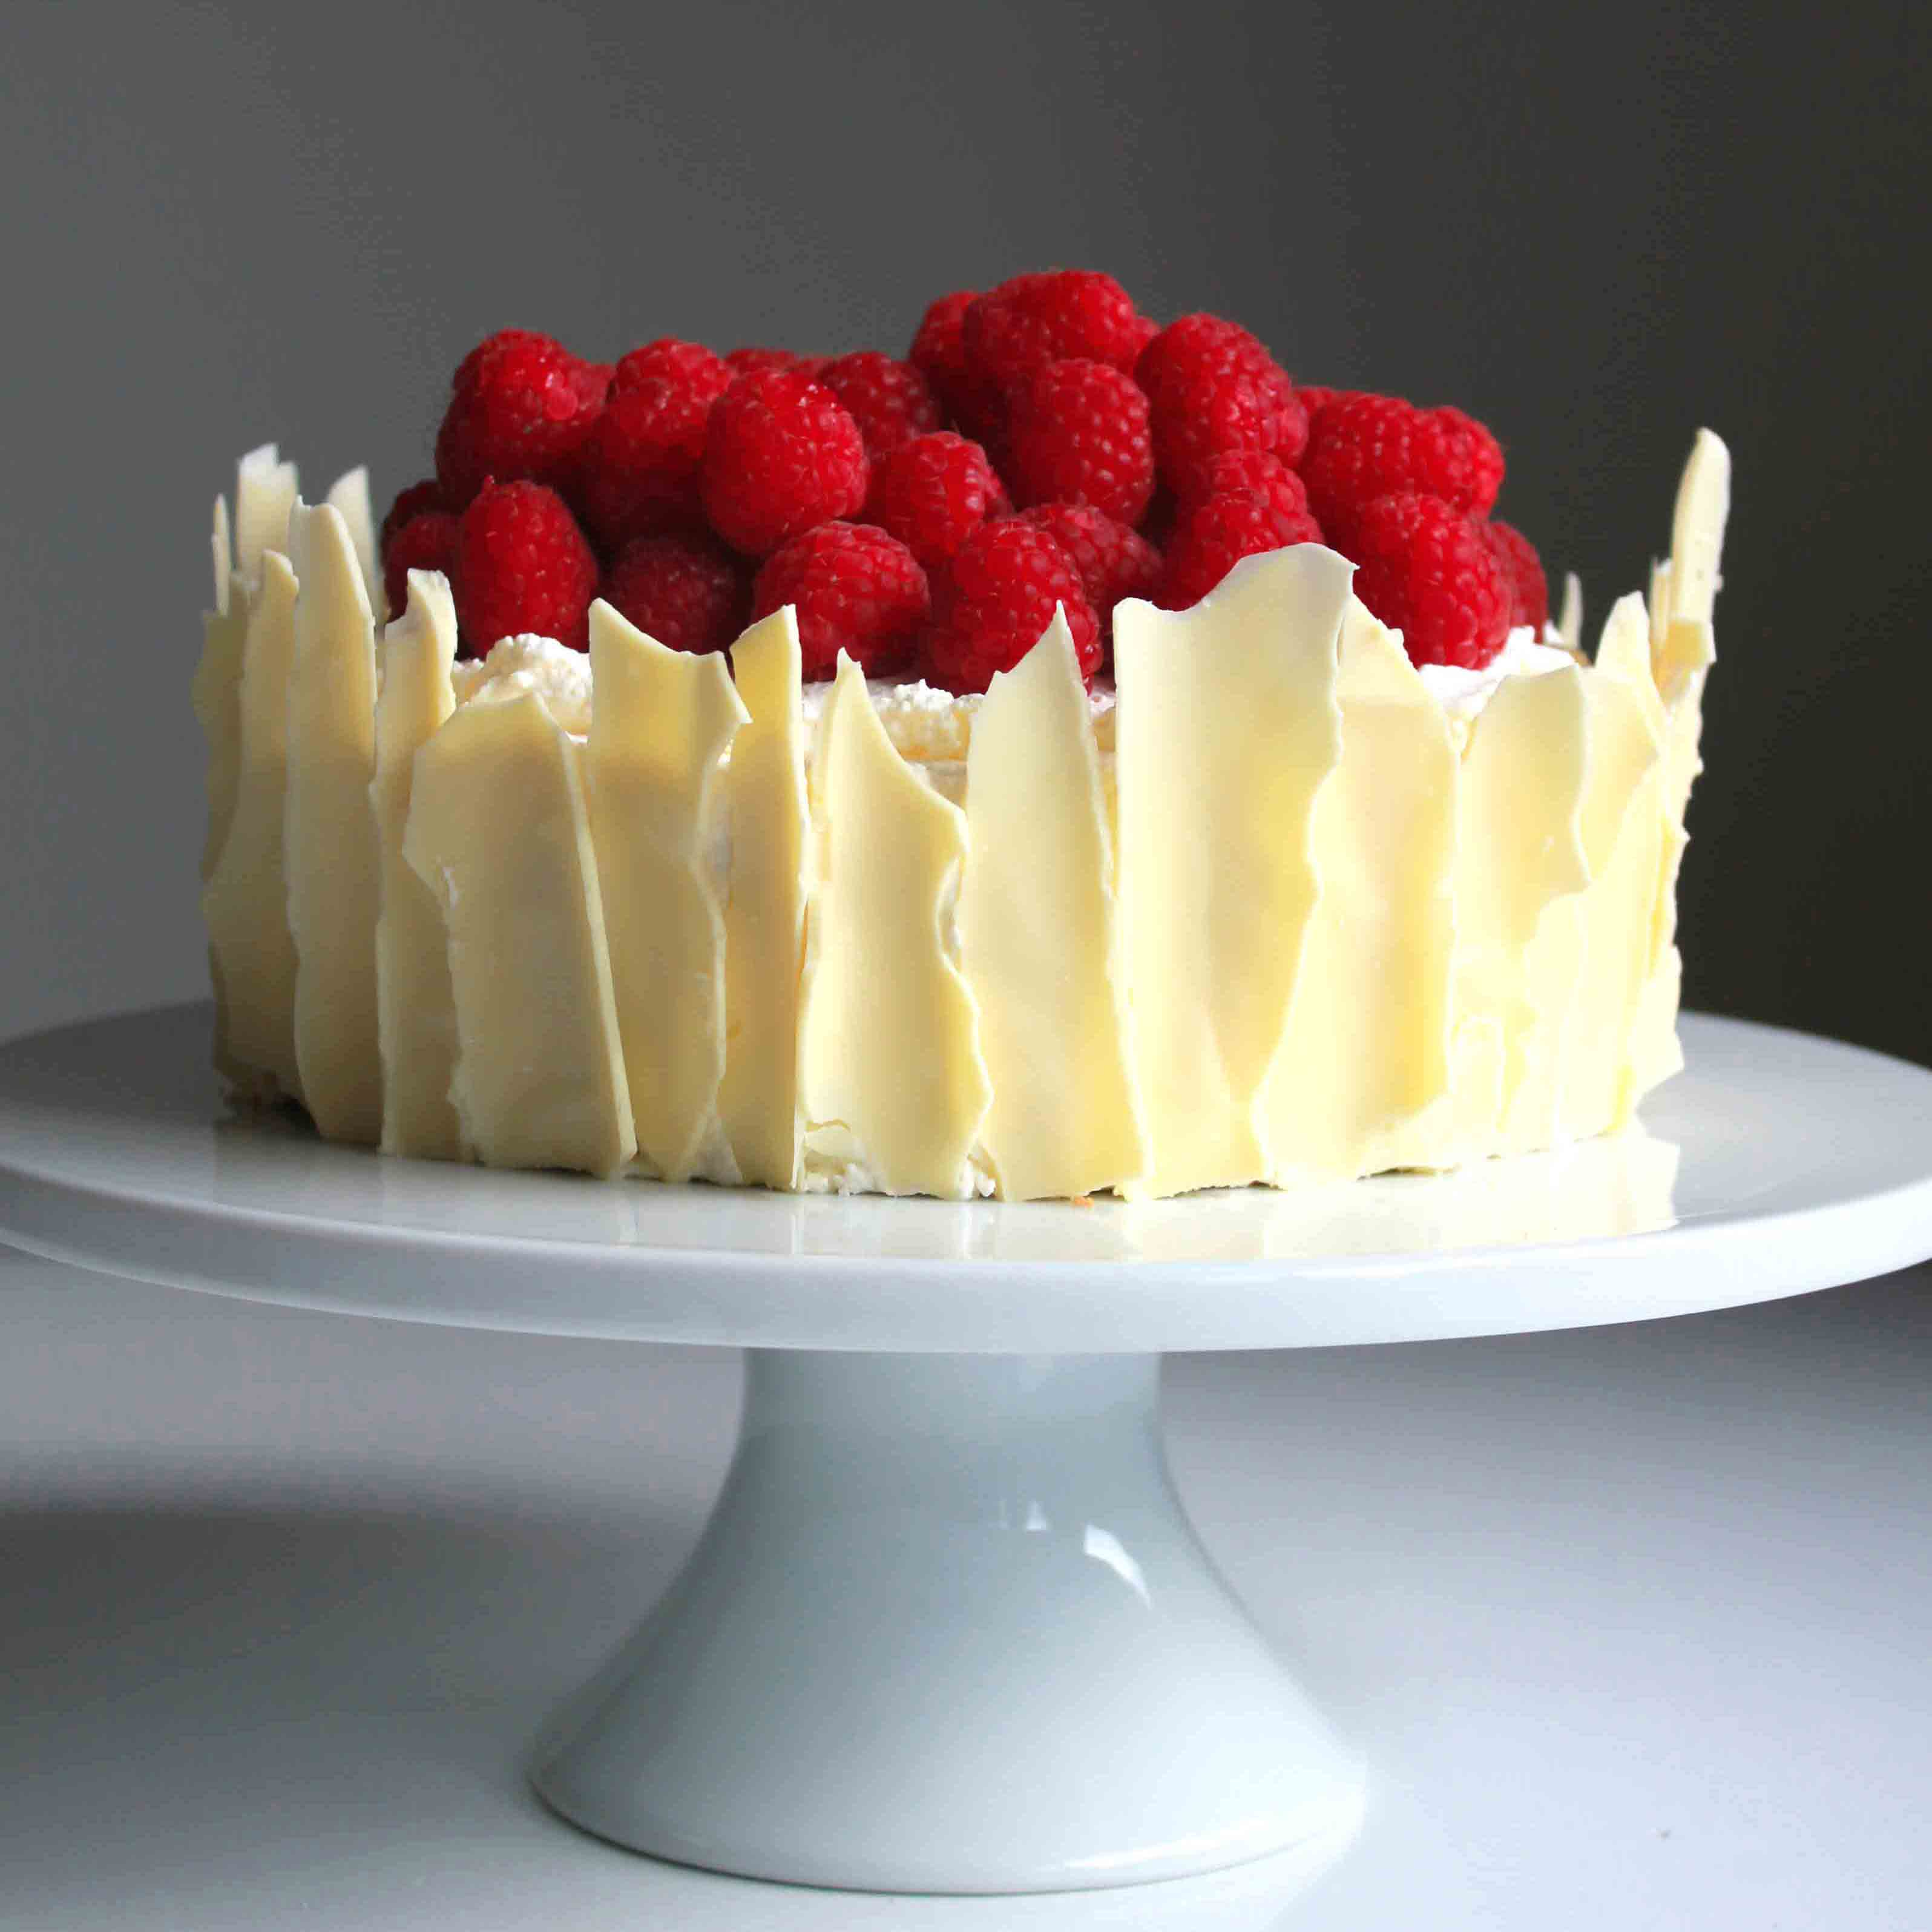 Sponge cake recipe white chocolate